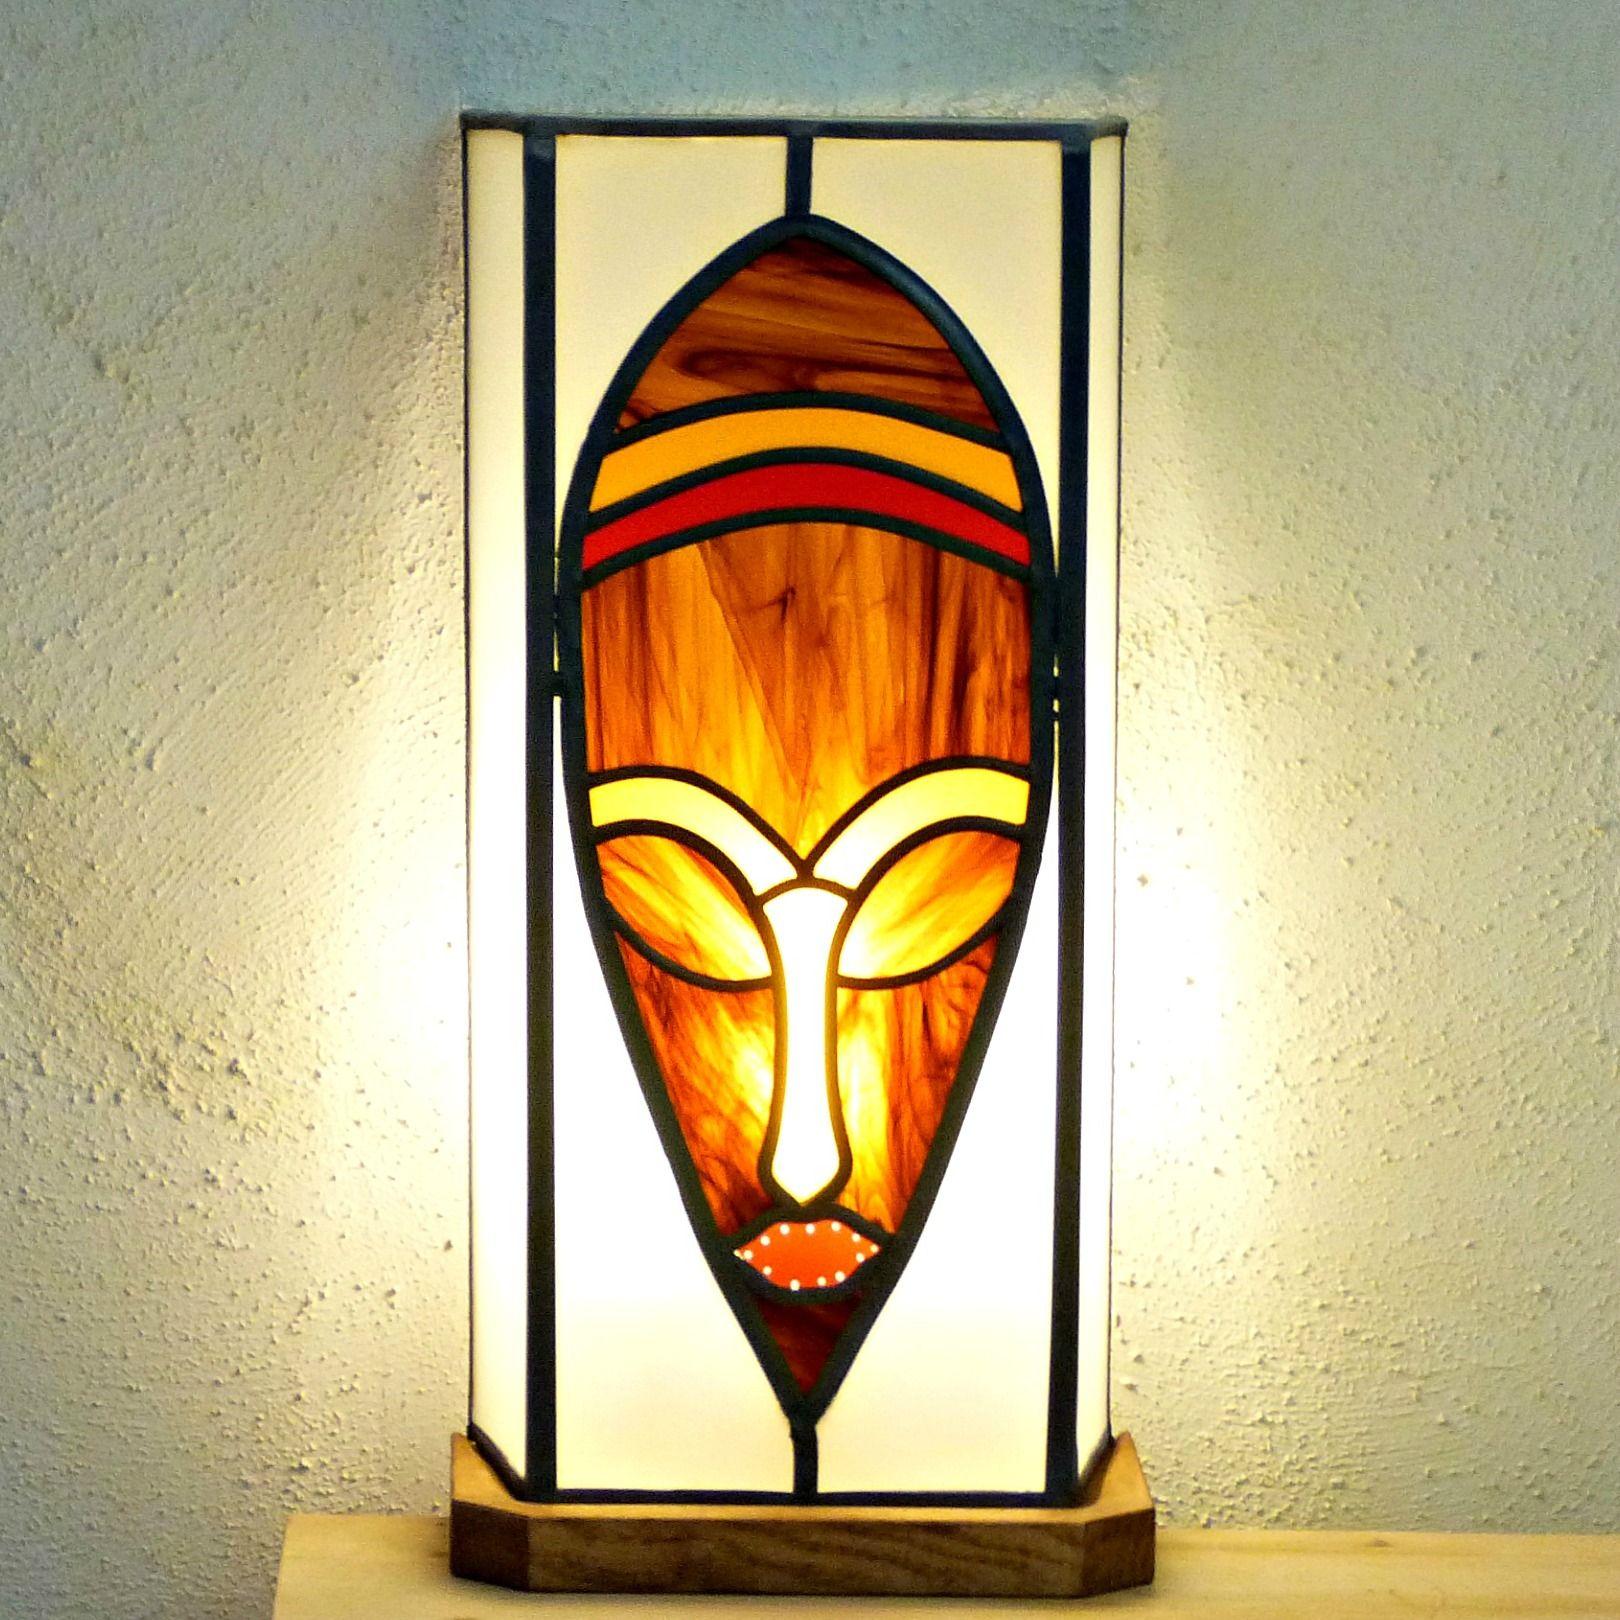 luminaire vitrail masque africain vitrail pinterest masques africains vitraux et masque. Black Bedroom Furniture Sets. Home Design Ideas